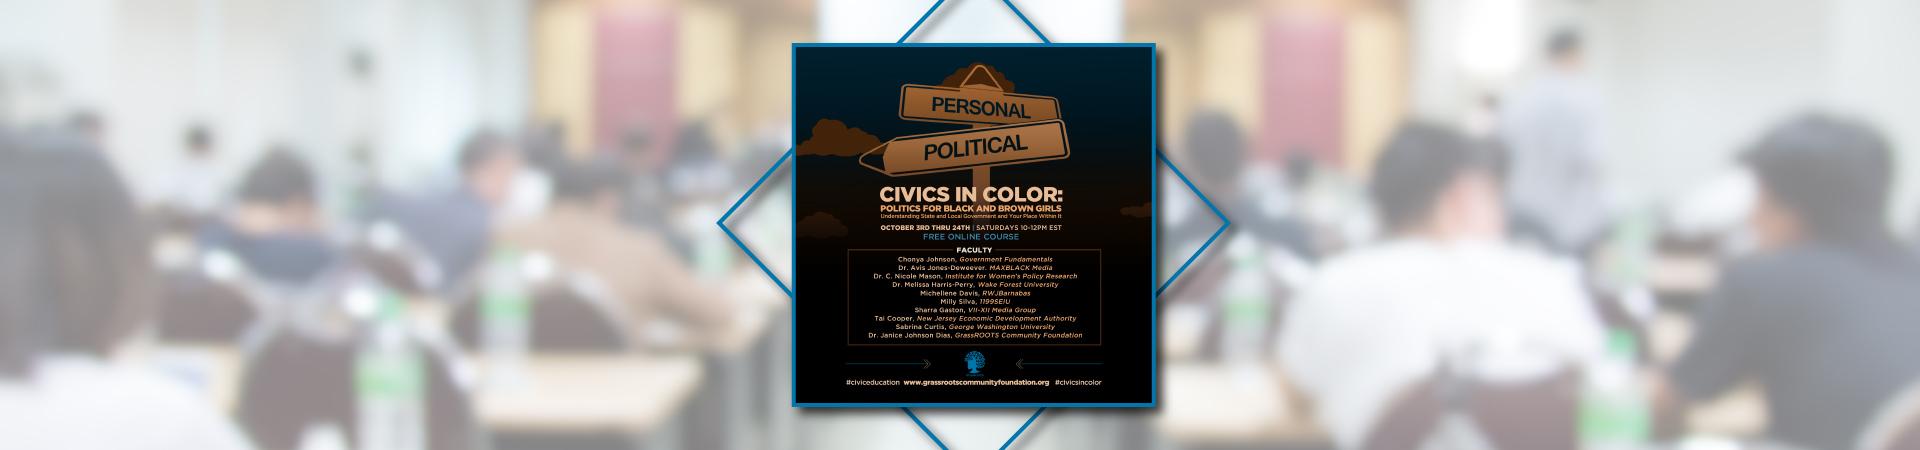 Civics in Color slide